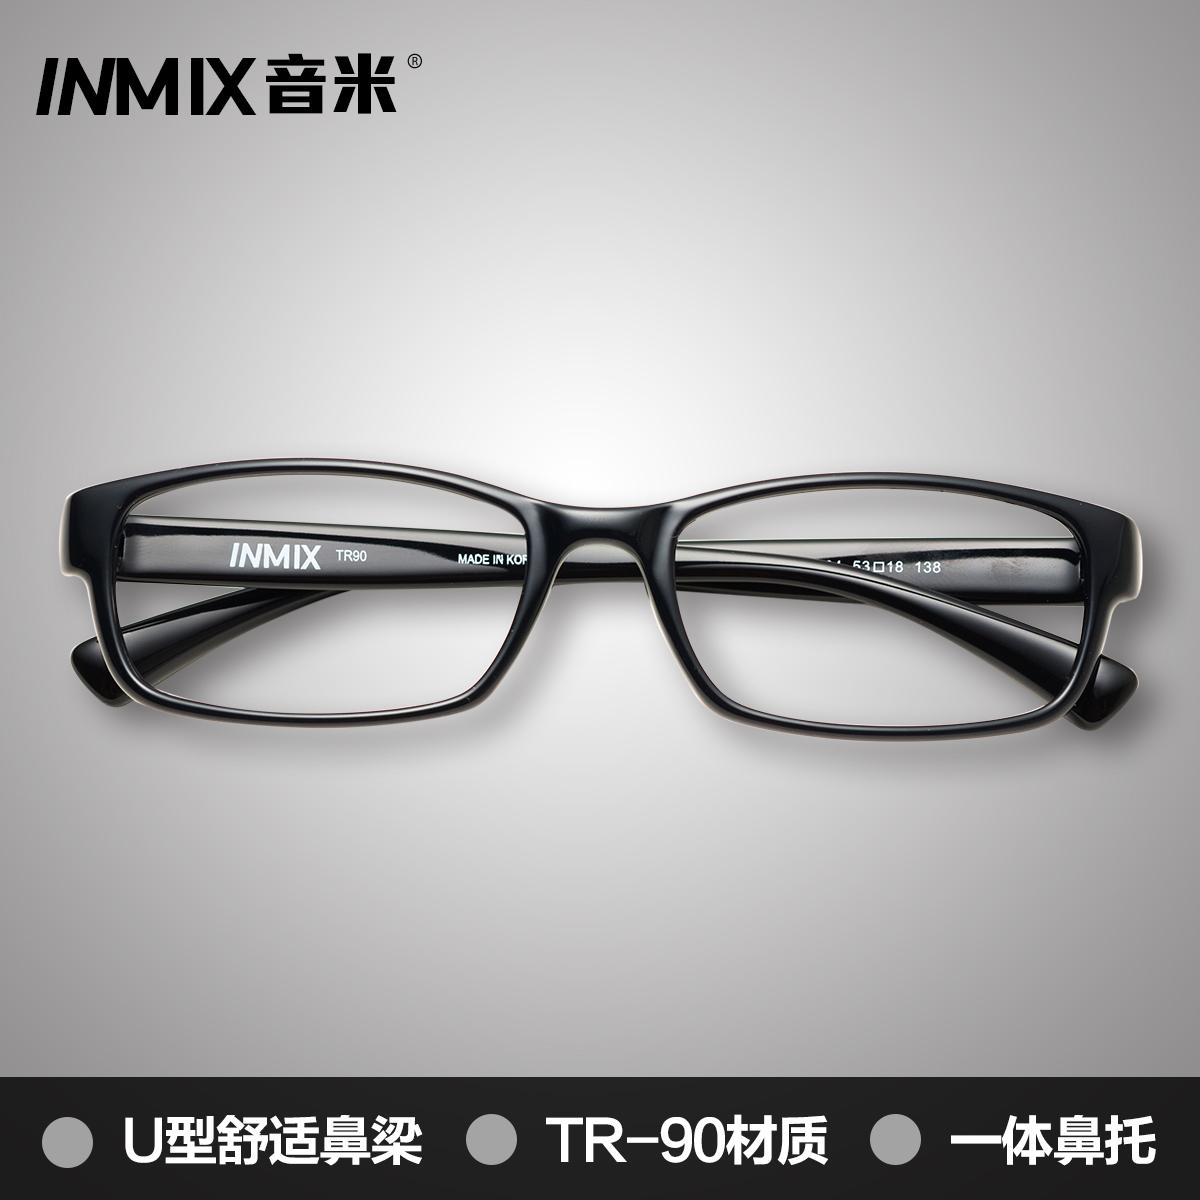 7b6f3a6a64 inmix sound meter retro fashion female ultralight full frame myopia frames  tide student couple glasses eyeglass